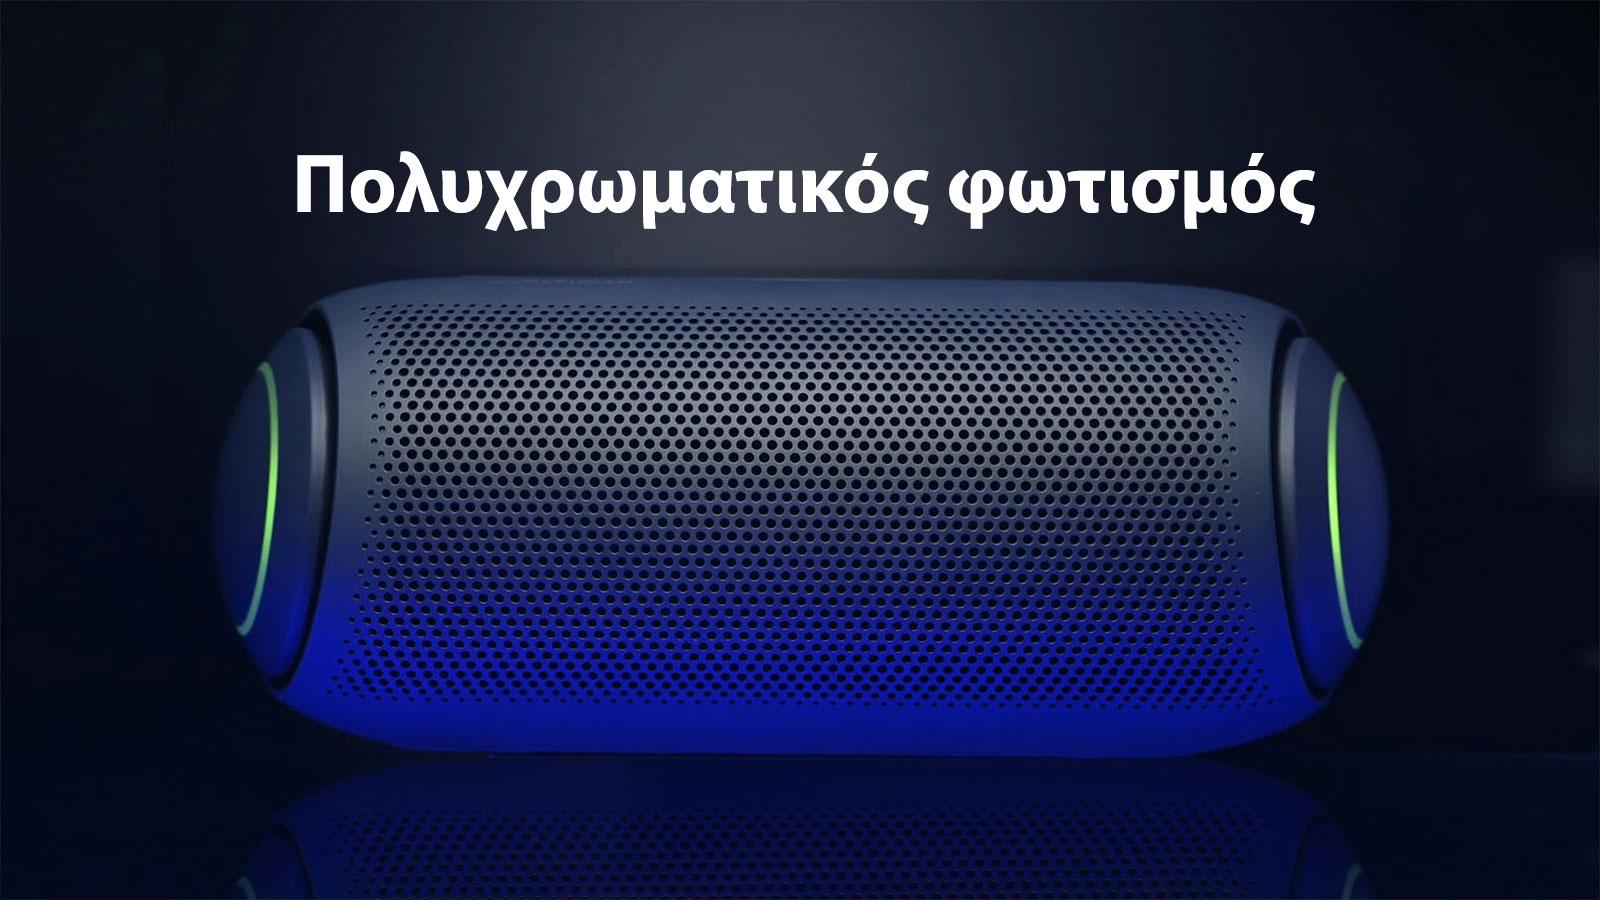 AV-XBOOMGo-PL7-11-Multi-Color-Lighting-video-Desktop